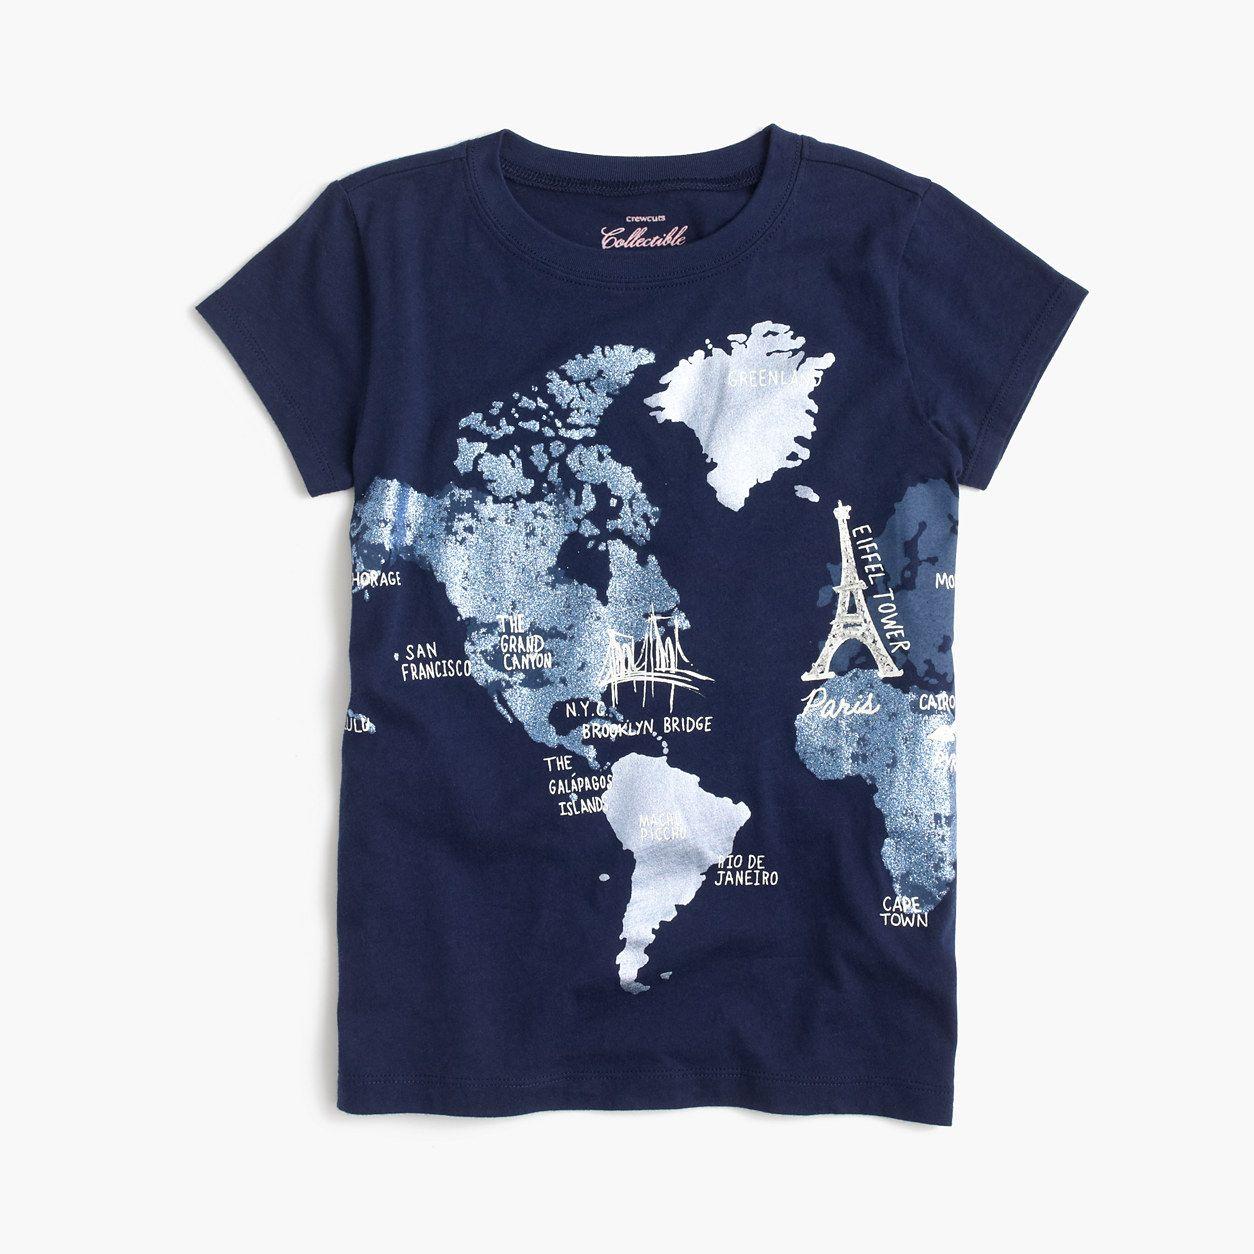 Crewcuts Girls Glitter World Map T Shirt Size 2 Kid Products